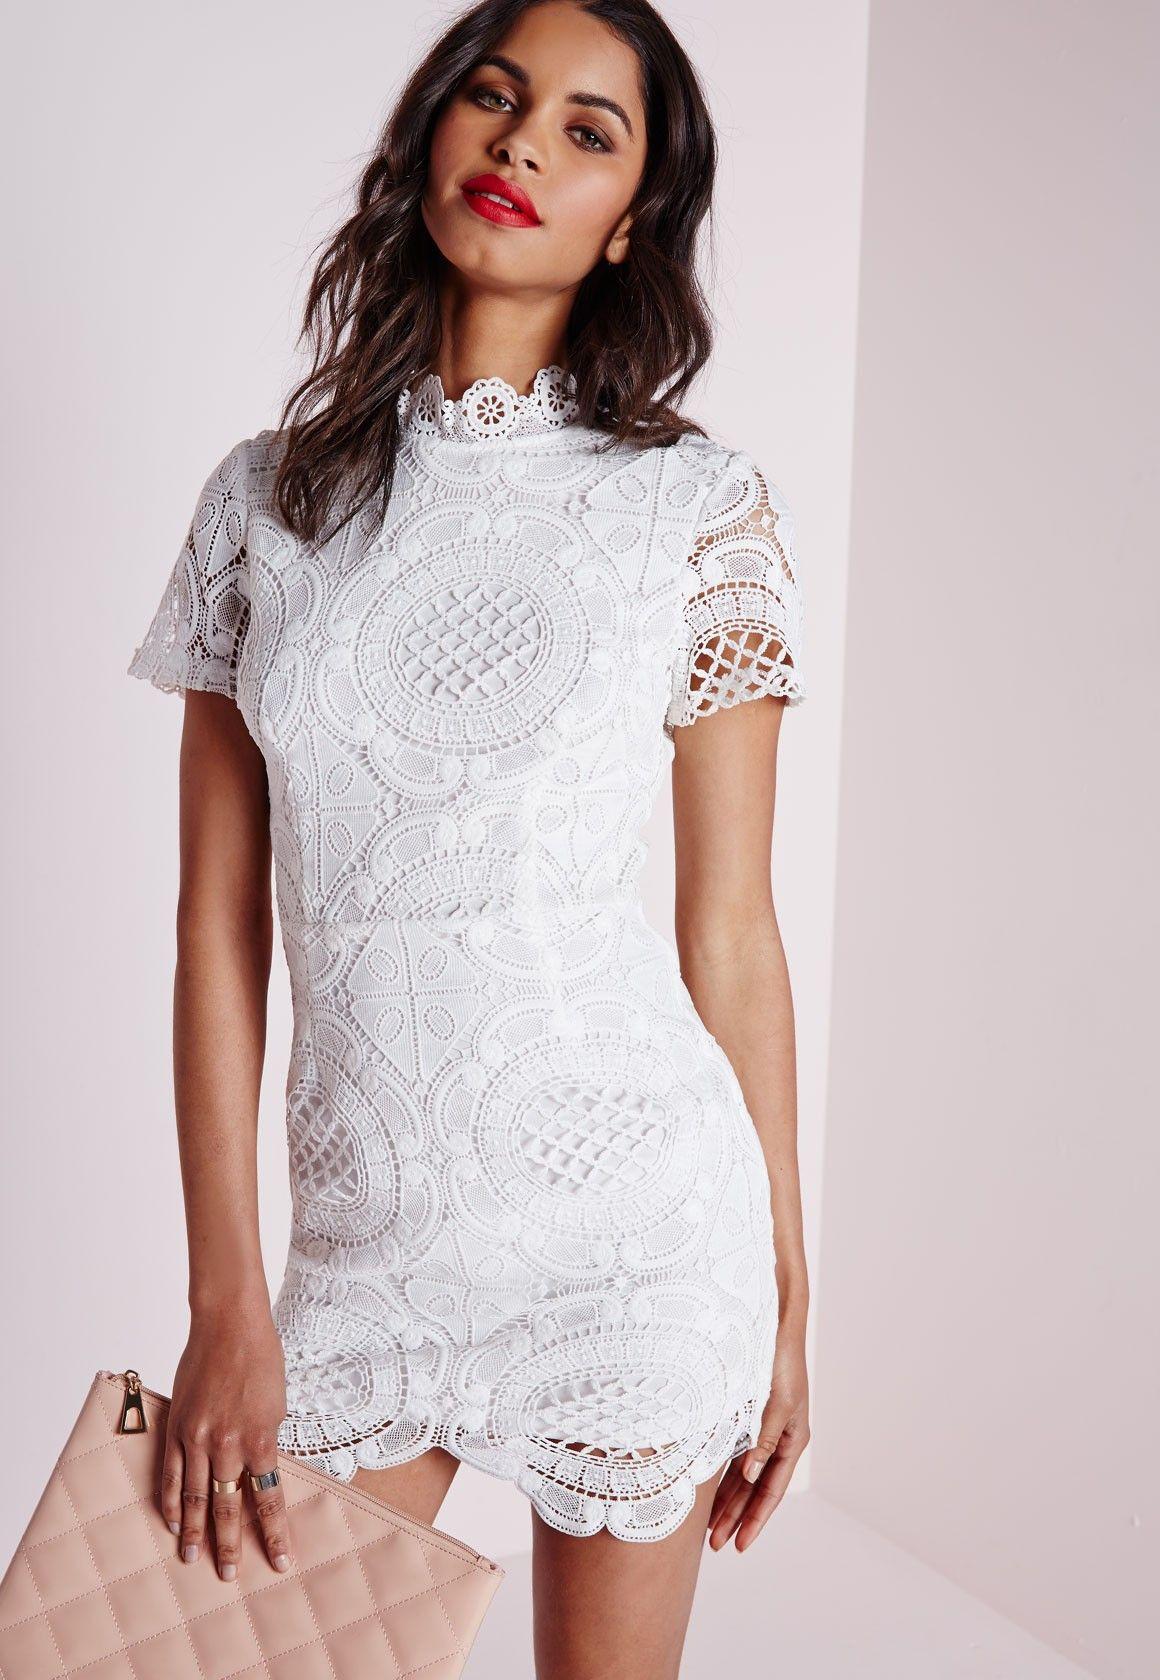 Missguided - Robe en dentelle blanche festonnée   cyrielle crushes ...